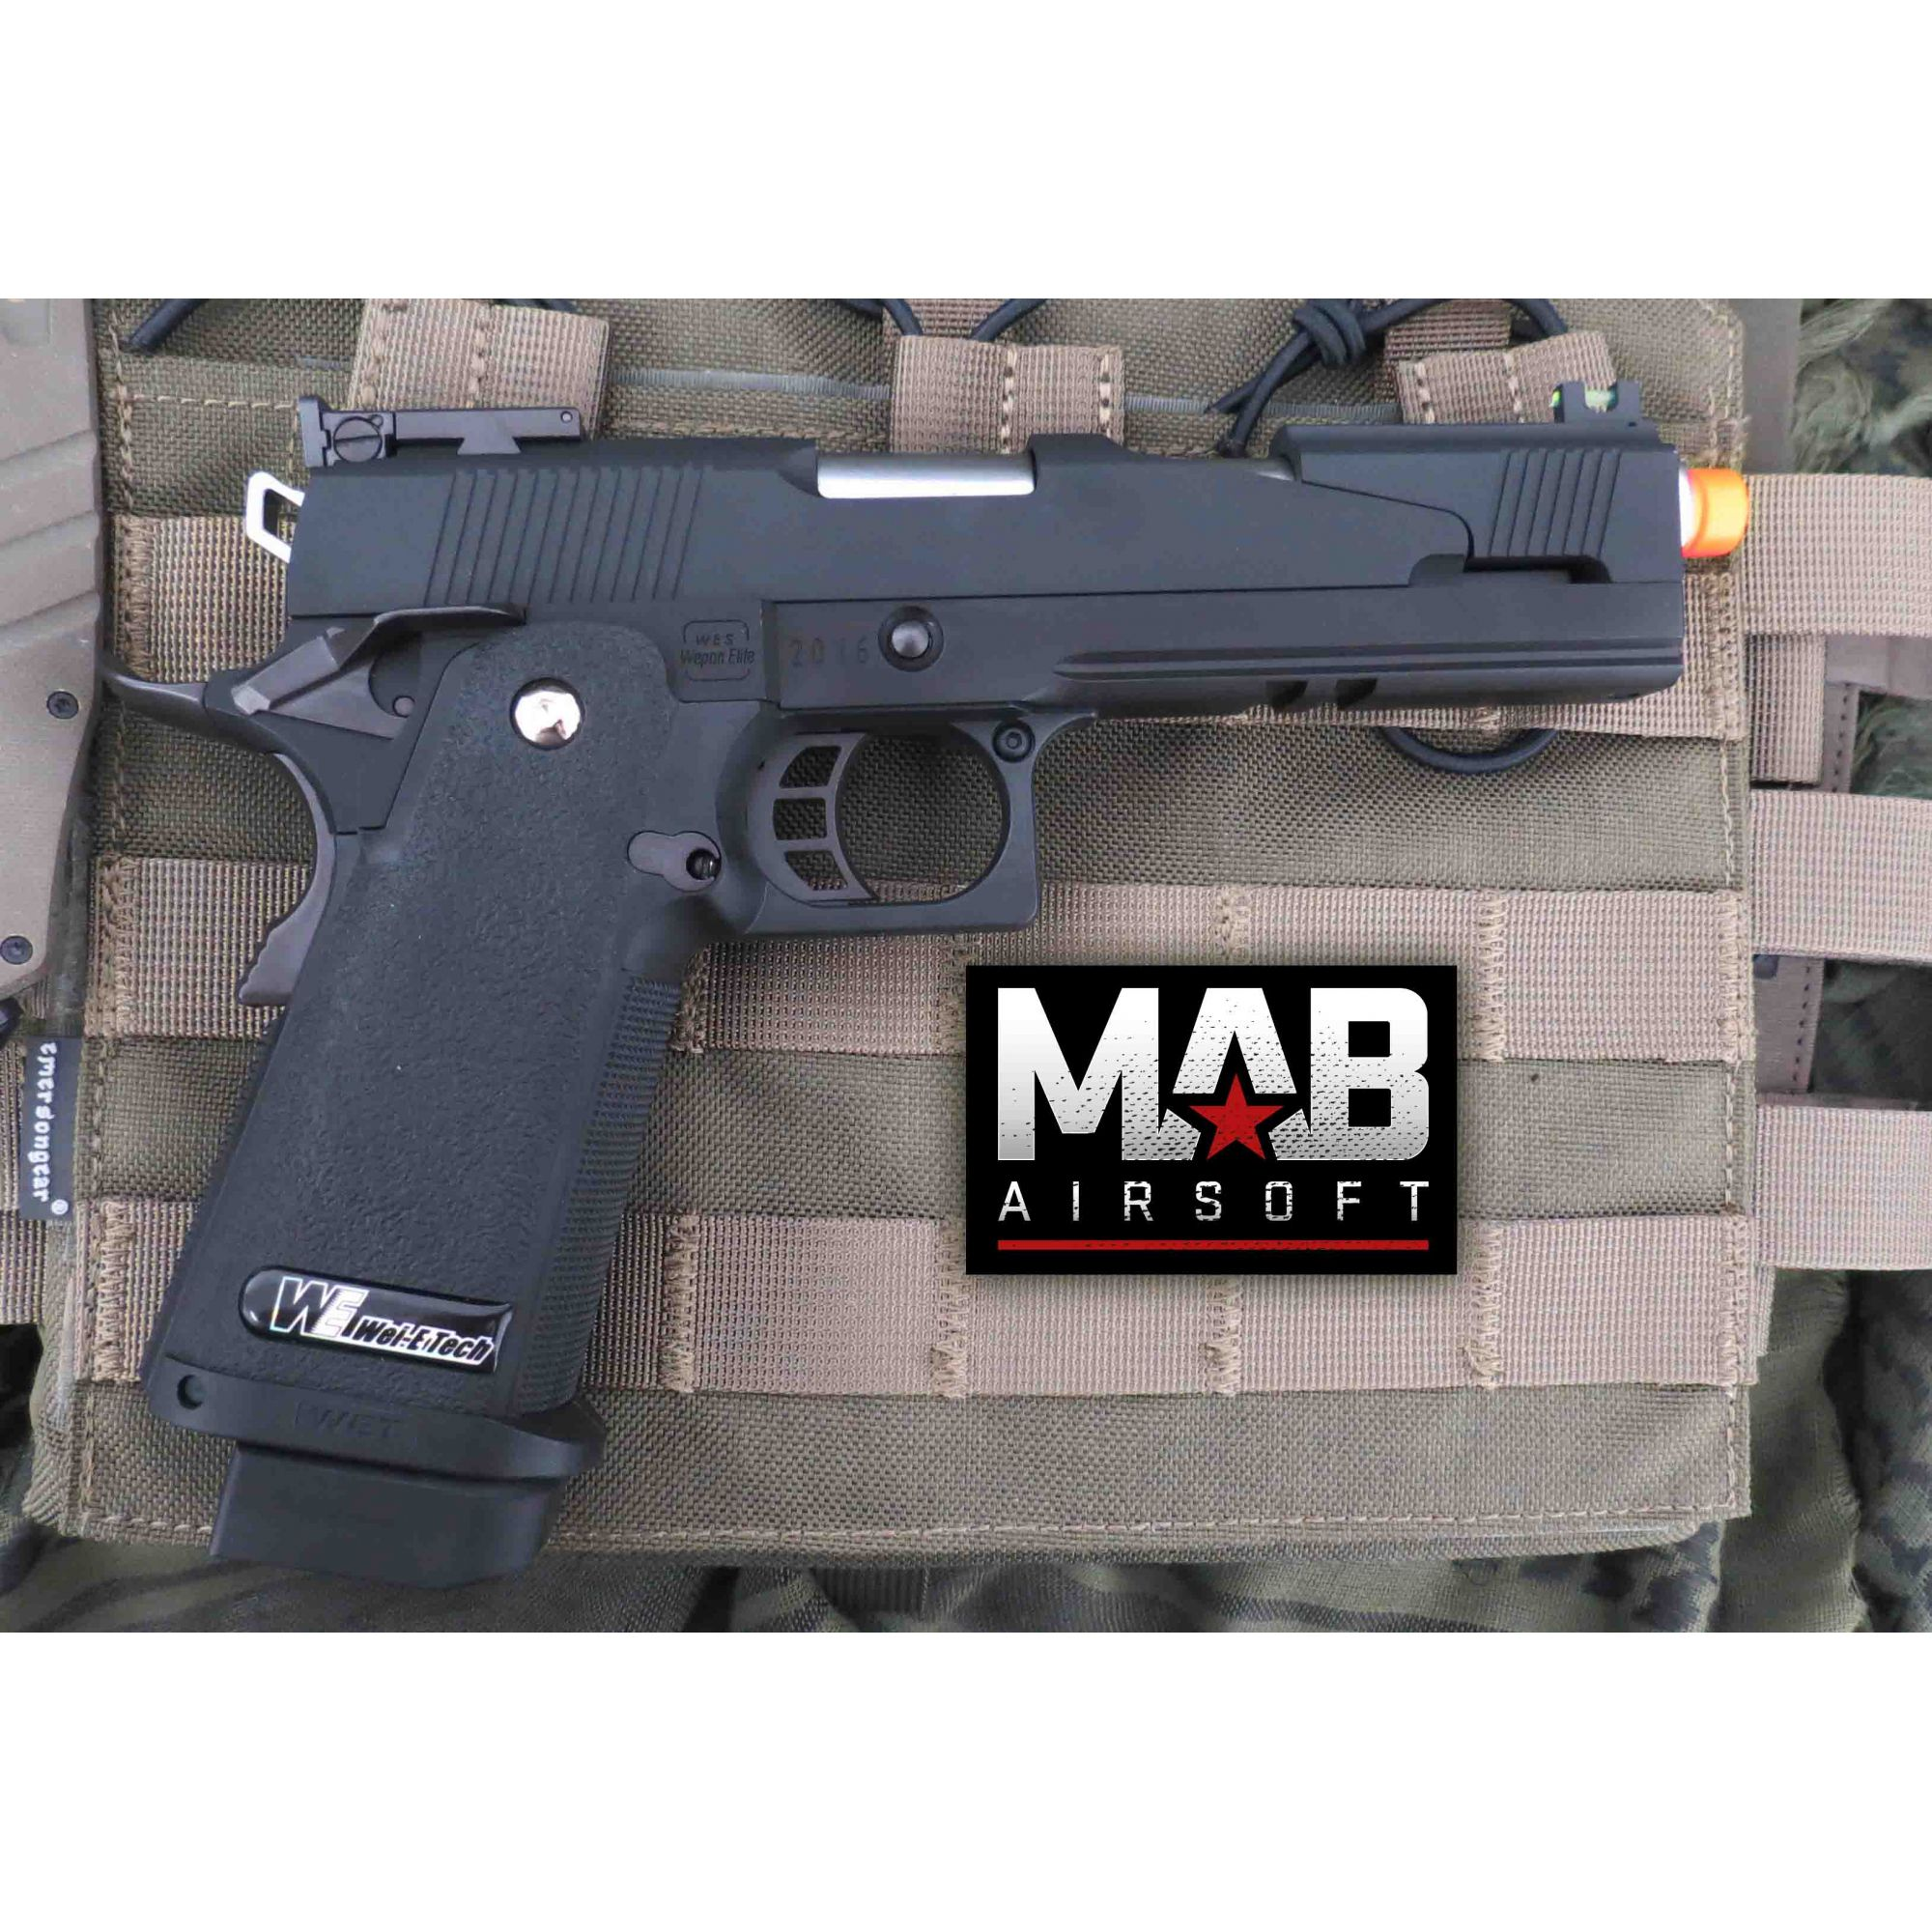 Pistola Airsoft WE Hi-Capa 5.1 A Black Dragon GBB Full Metal Preta - Calibre 6 mm  - MAB AIRSOFT